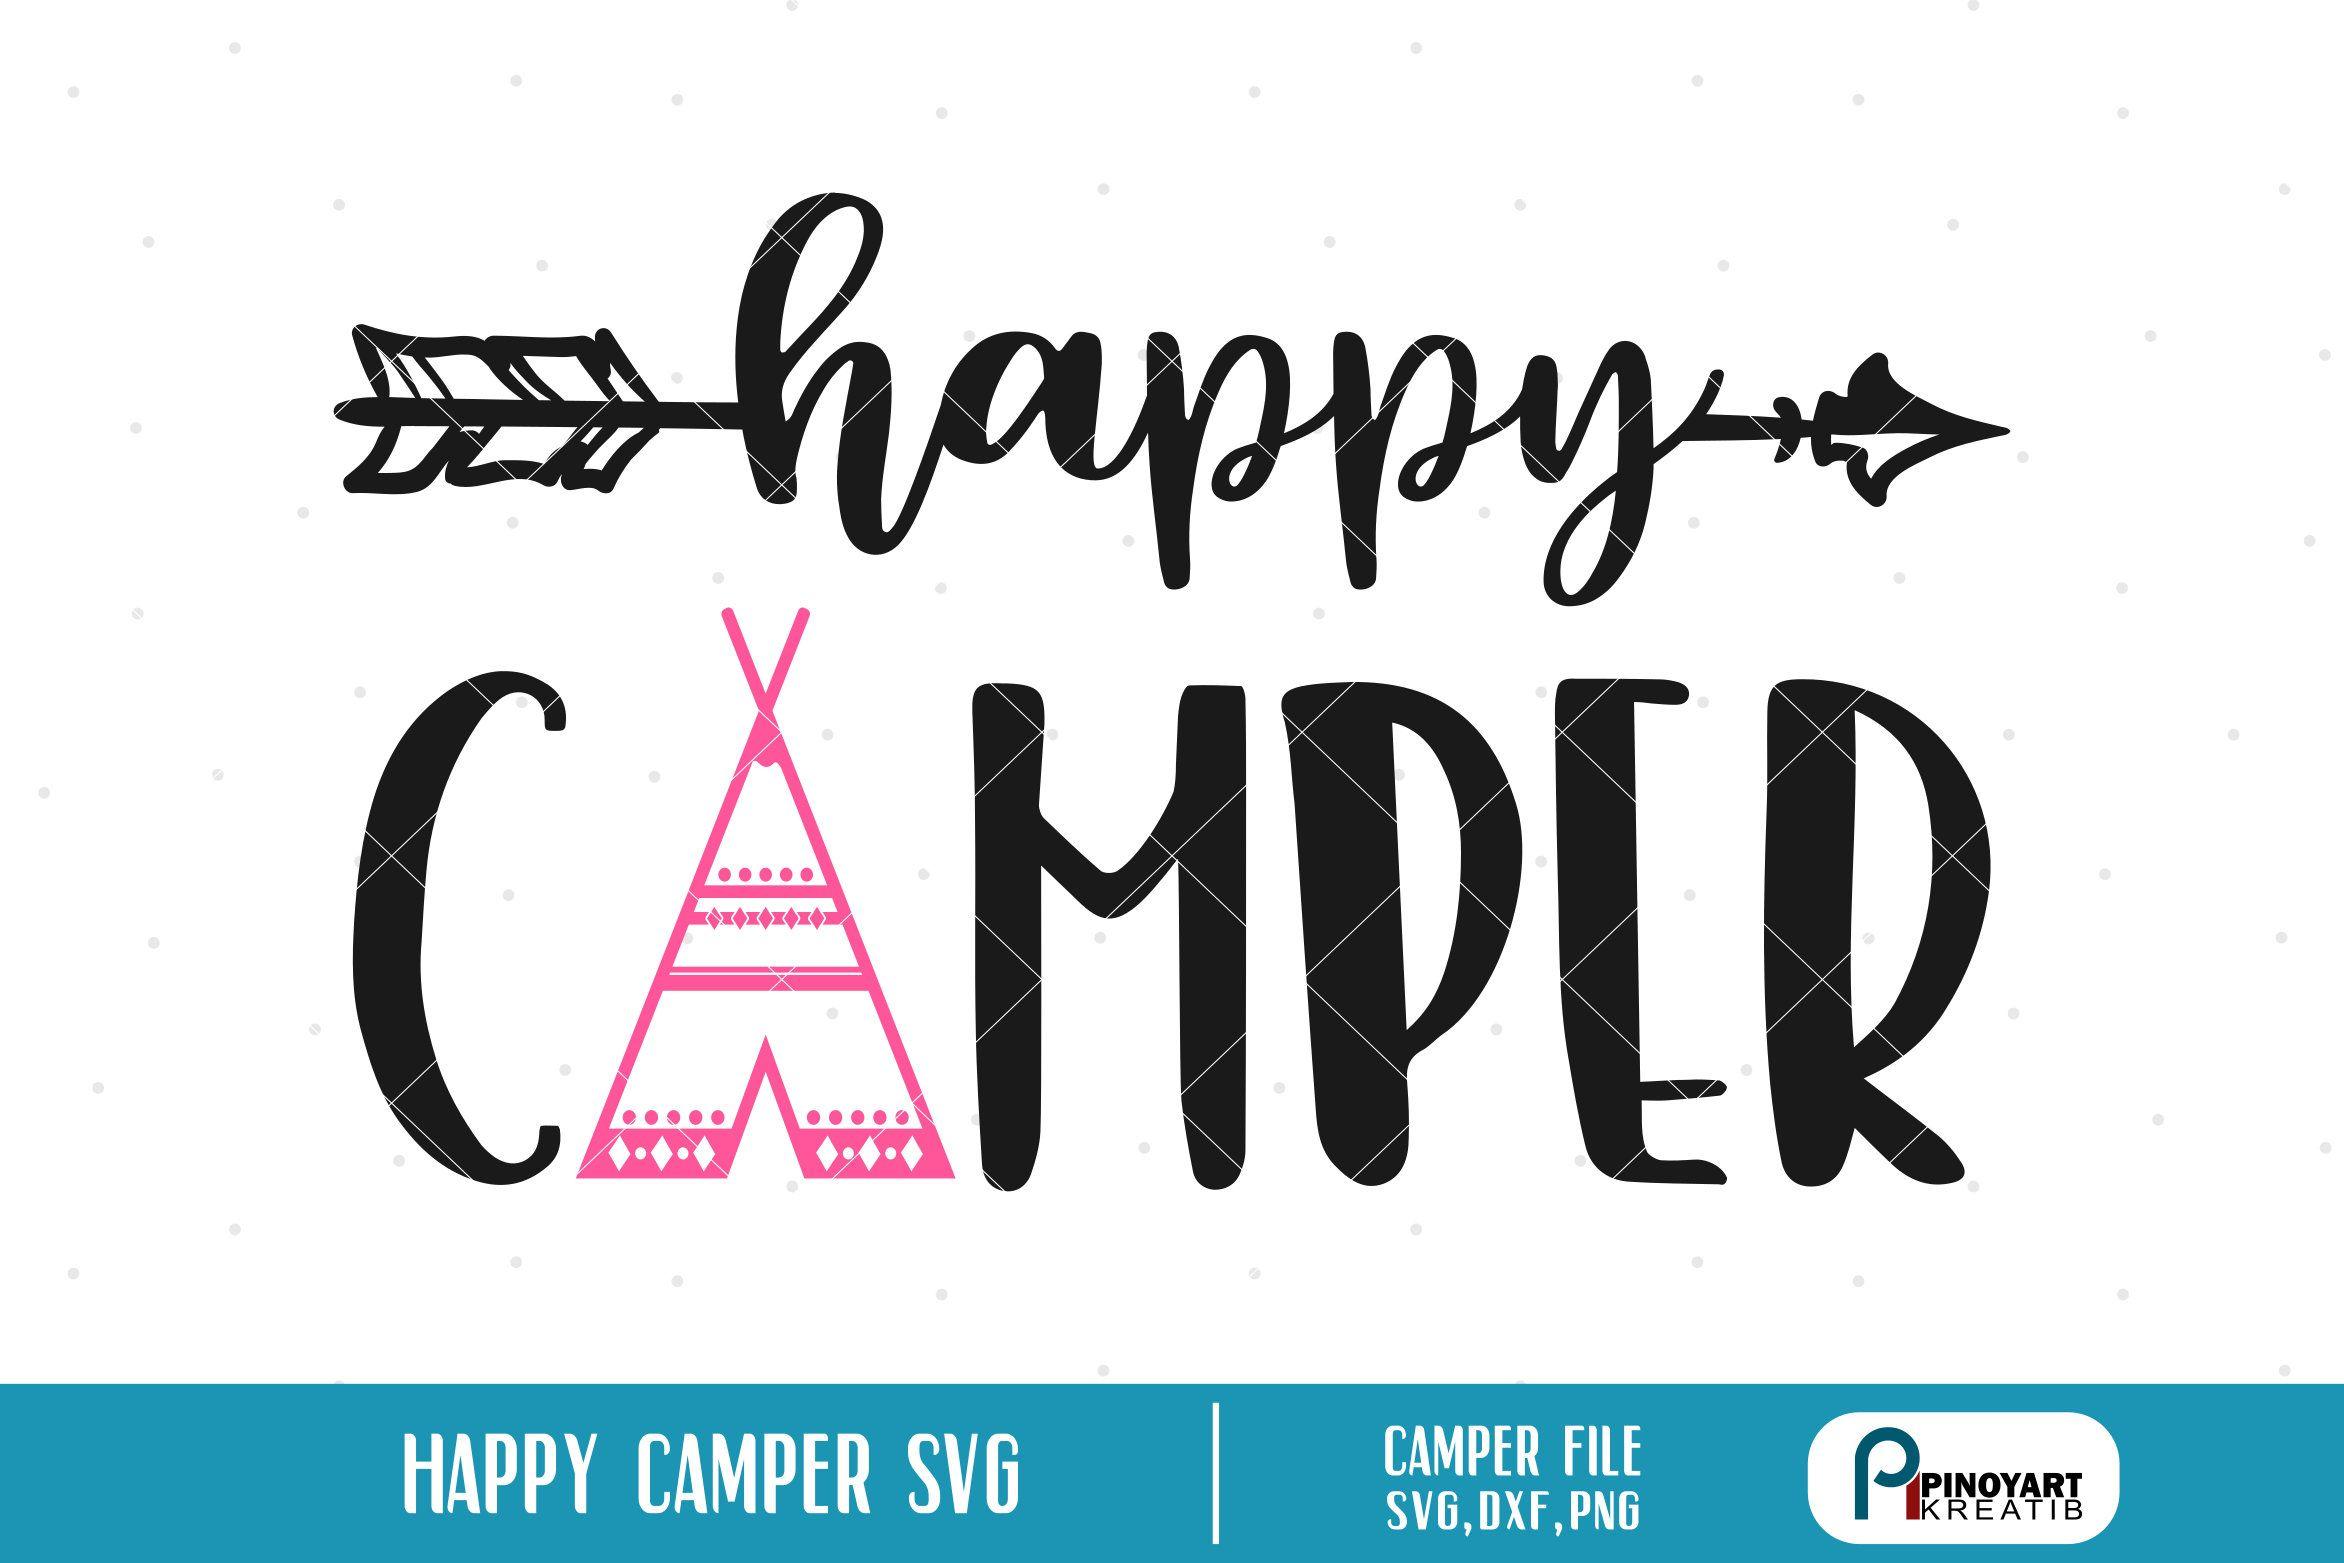 Happy camper svg, happy camper svg file, camper svg